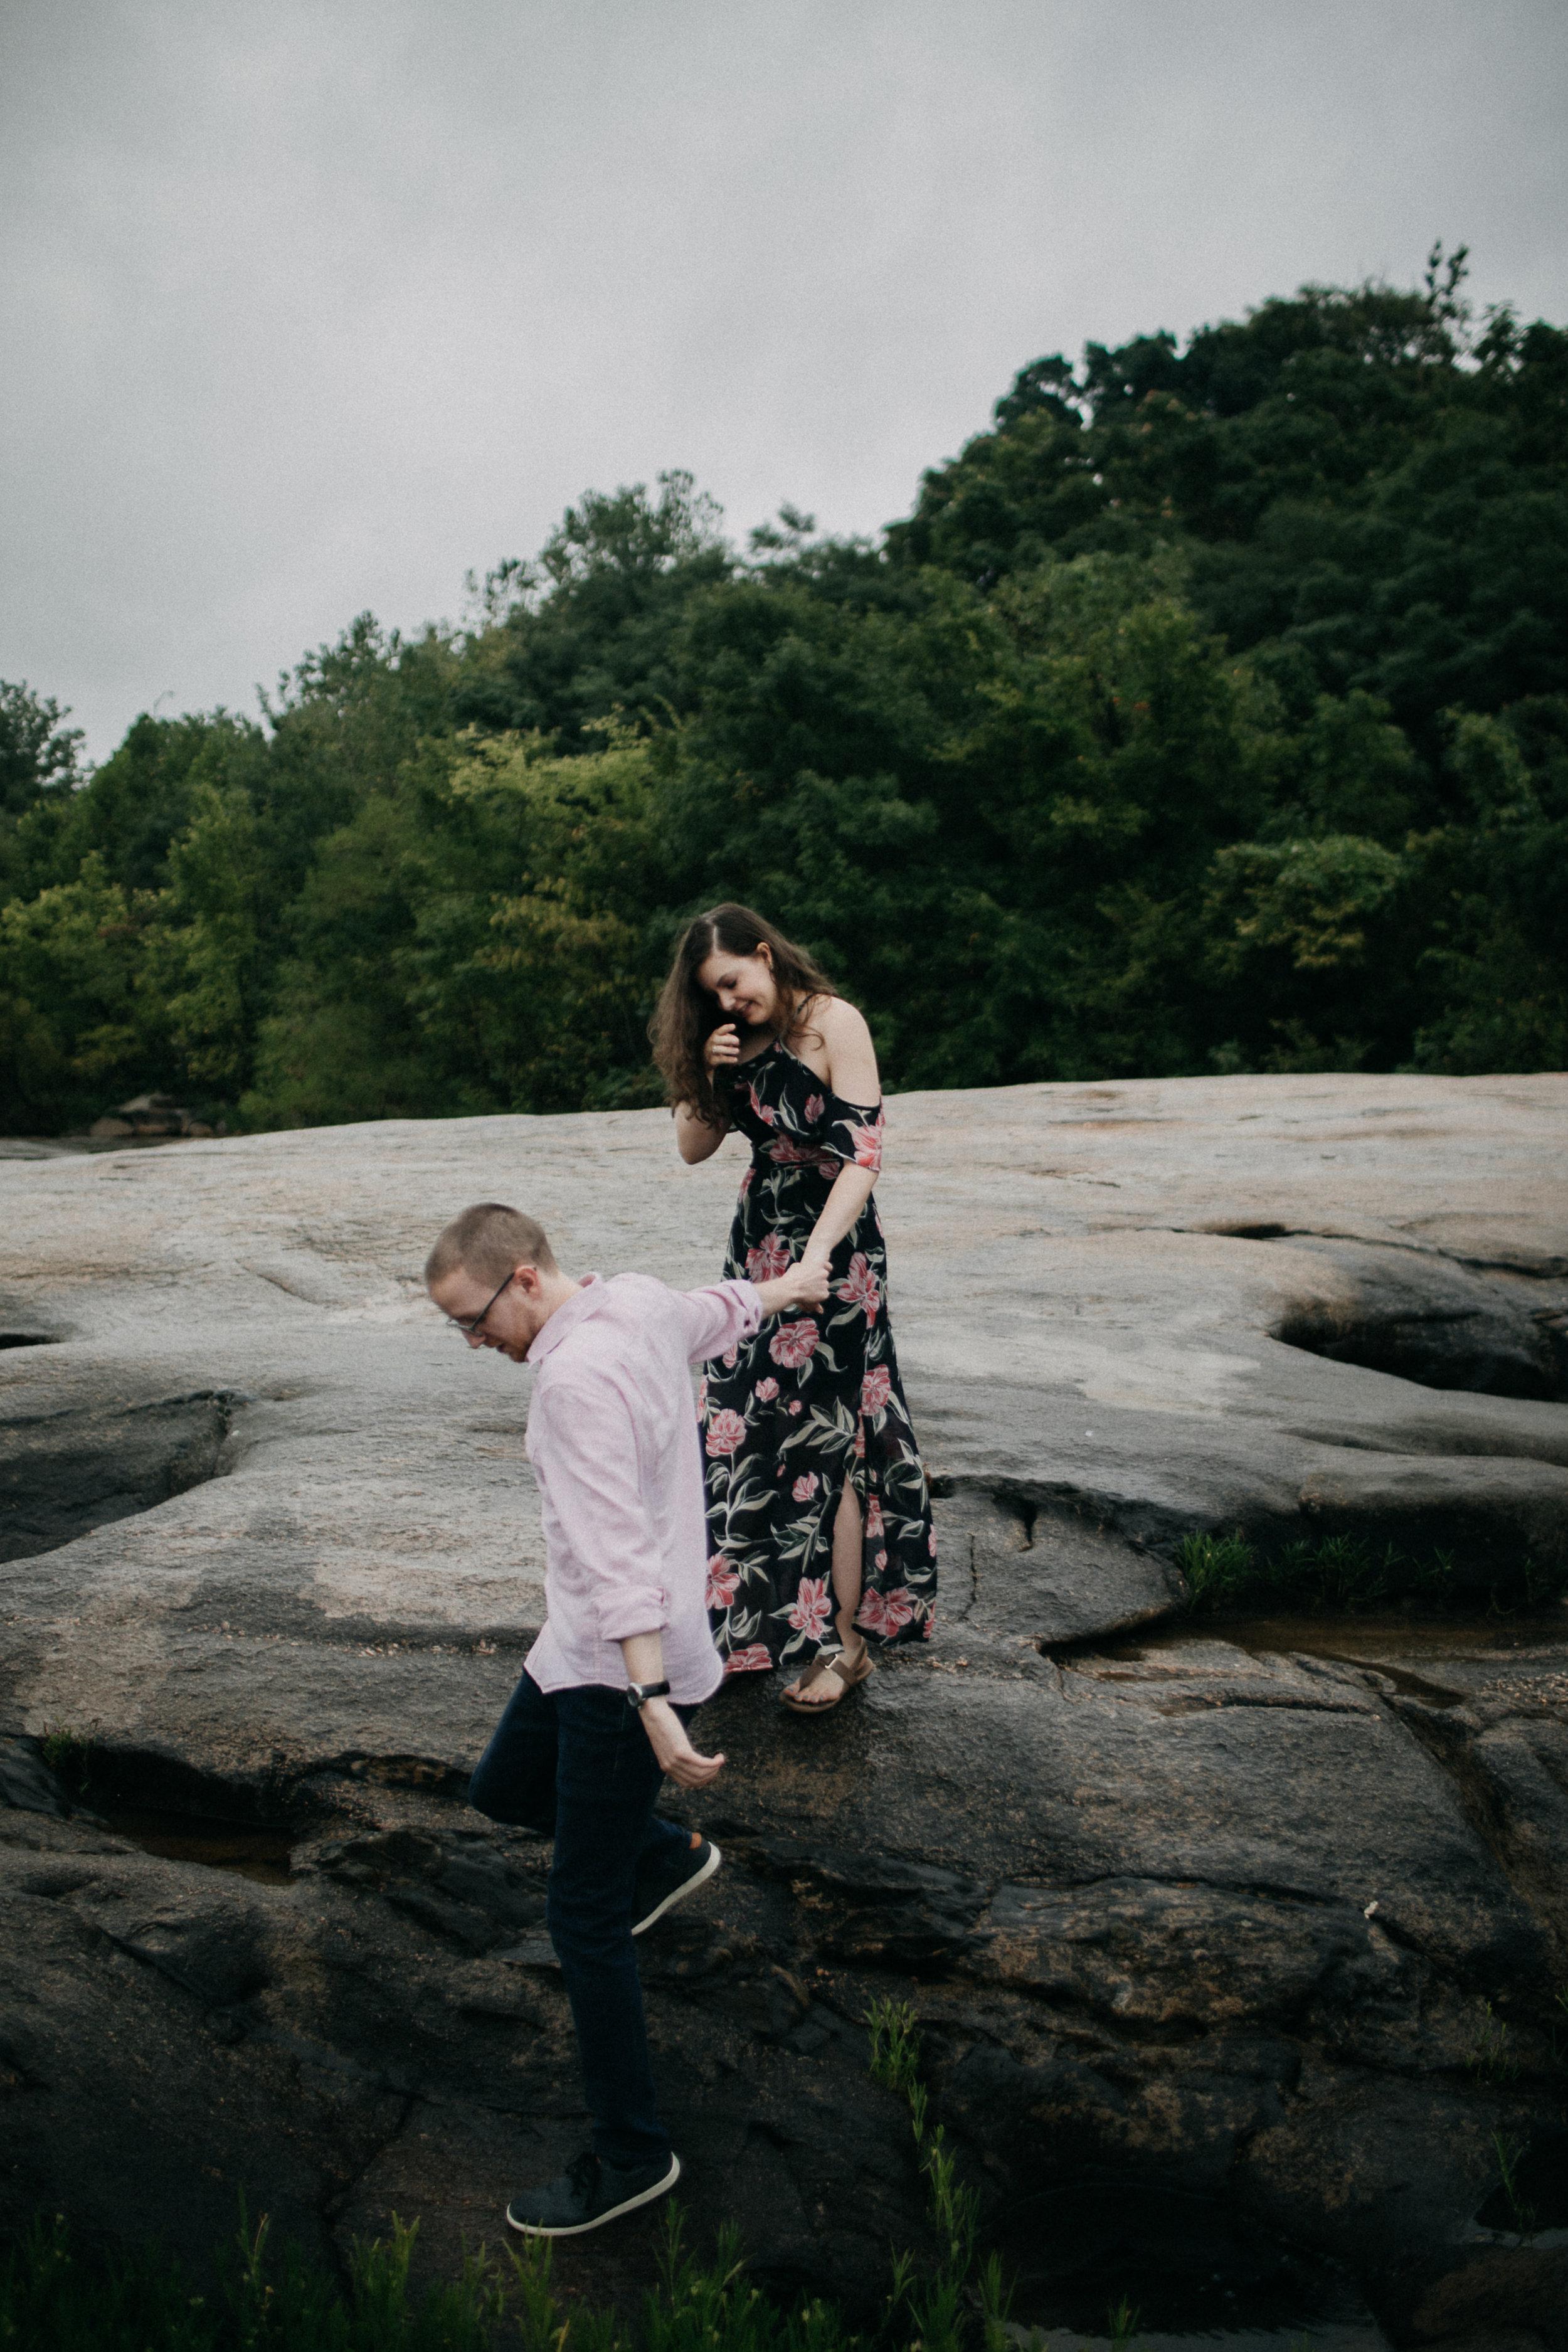 Photographybykelsey-engagement-Justin&Nicole-70.jpg